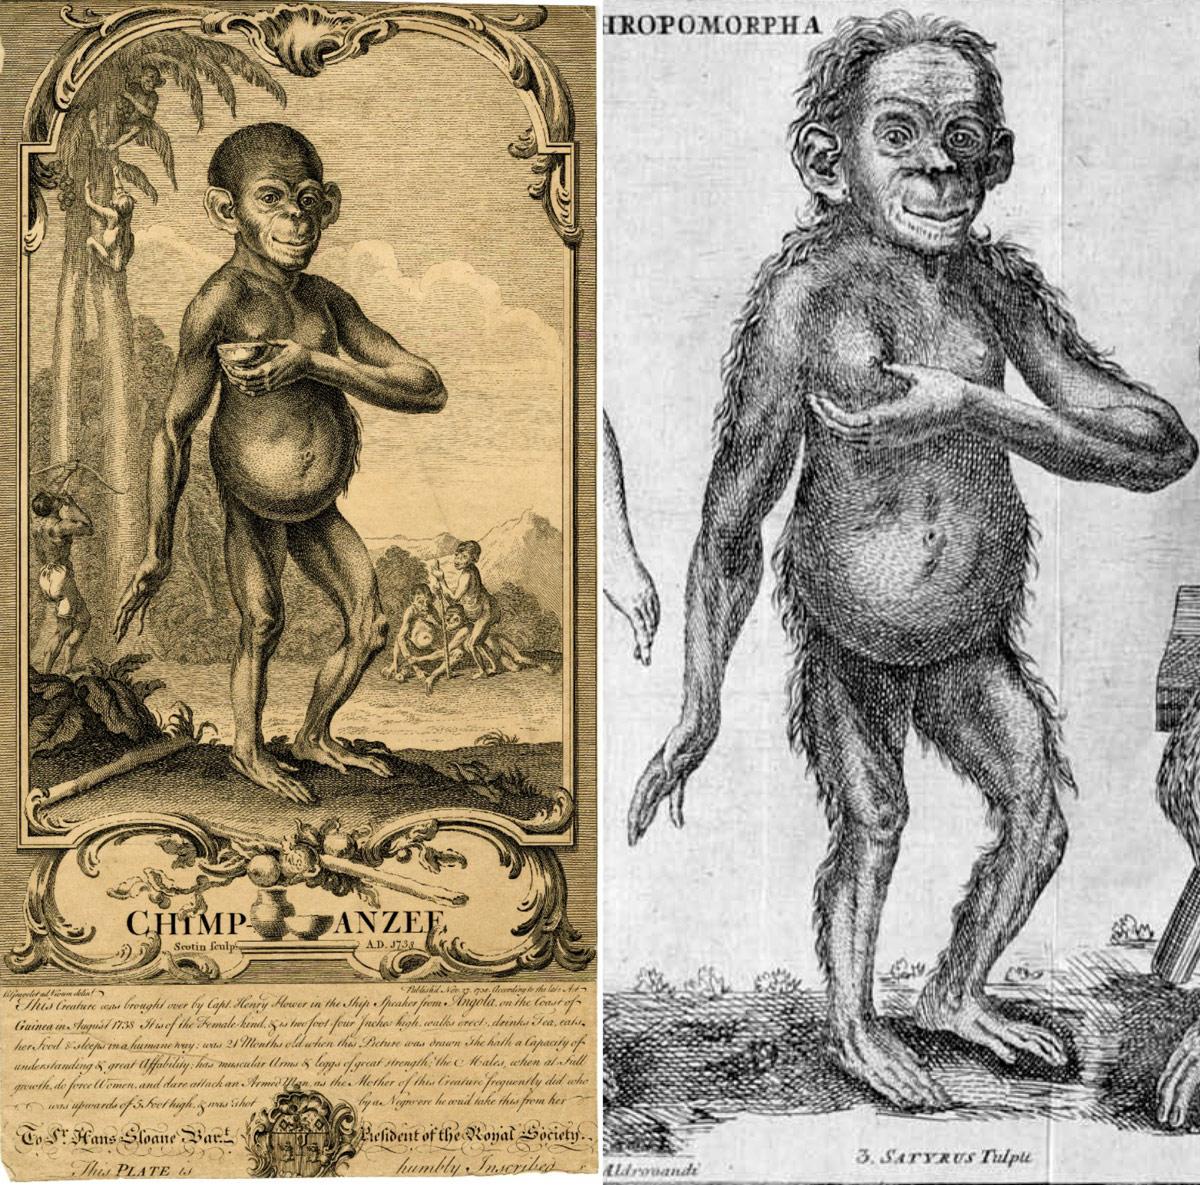 Chimpanzee-Hoppius